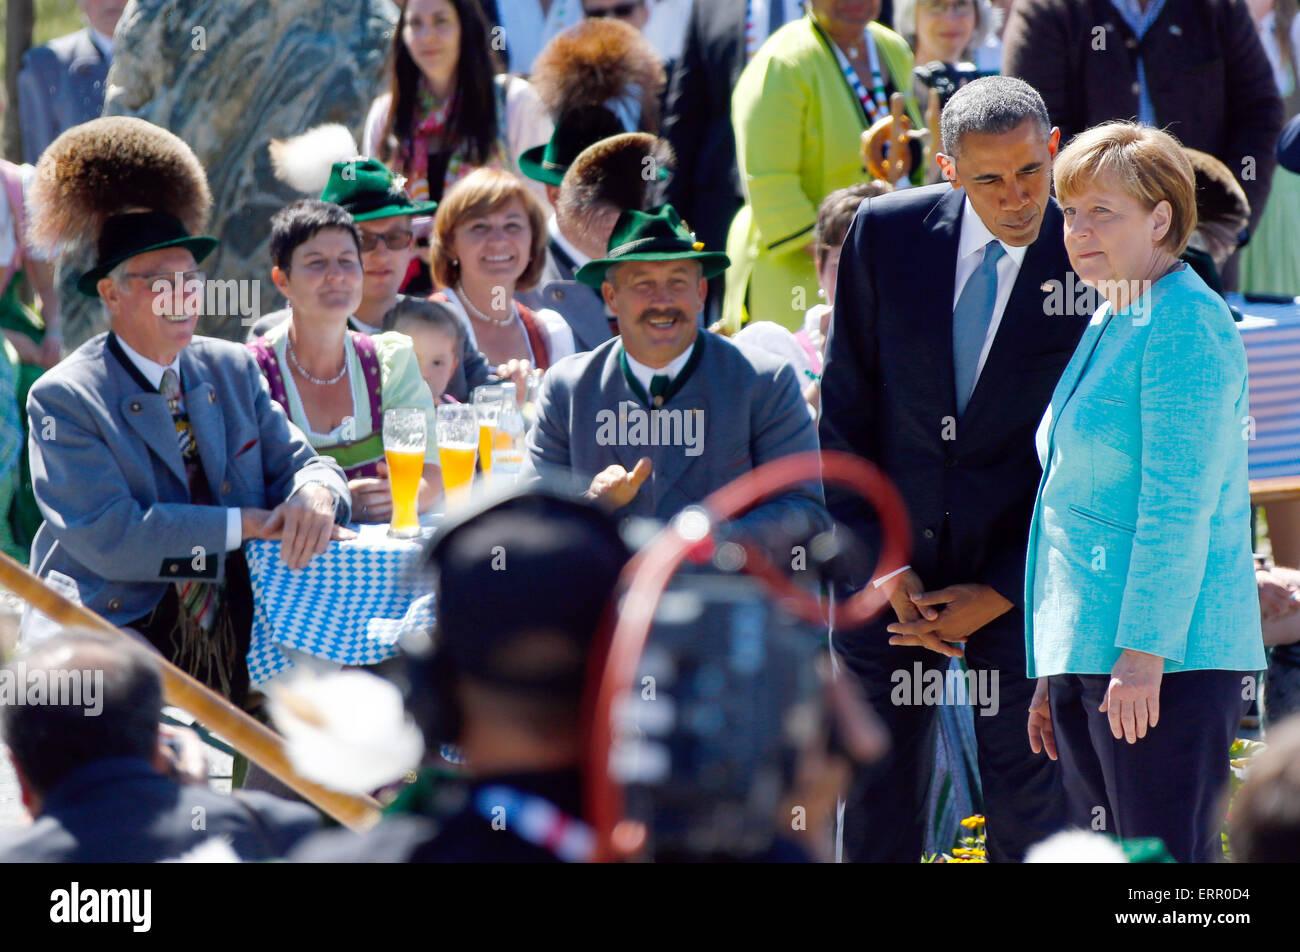 U.S. President Barack Obama talks to German Chancellor Angela Merkel, right, during a joint walk through the village of Kruen, southern Germany, Sunday, June 7, 2015 prior to the G-7 summit in Schloss Elmau hotel near Garmisch-Partenkirchen where the summit will start later the day. Photo: Matthias Schrader dpa Stock Photo